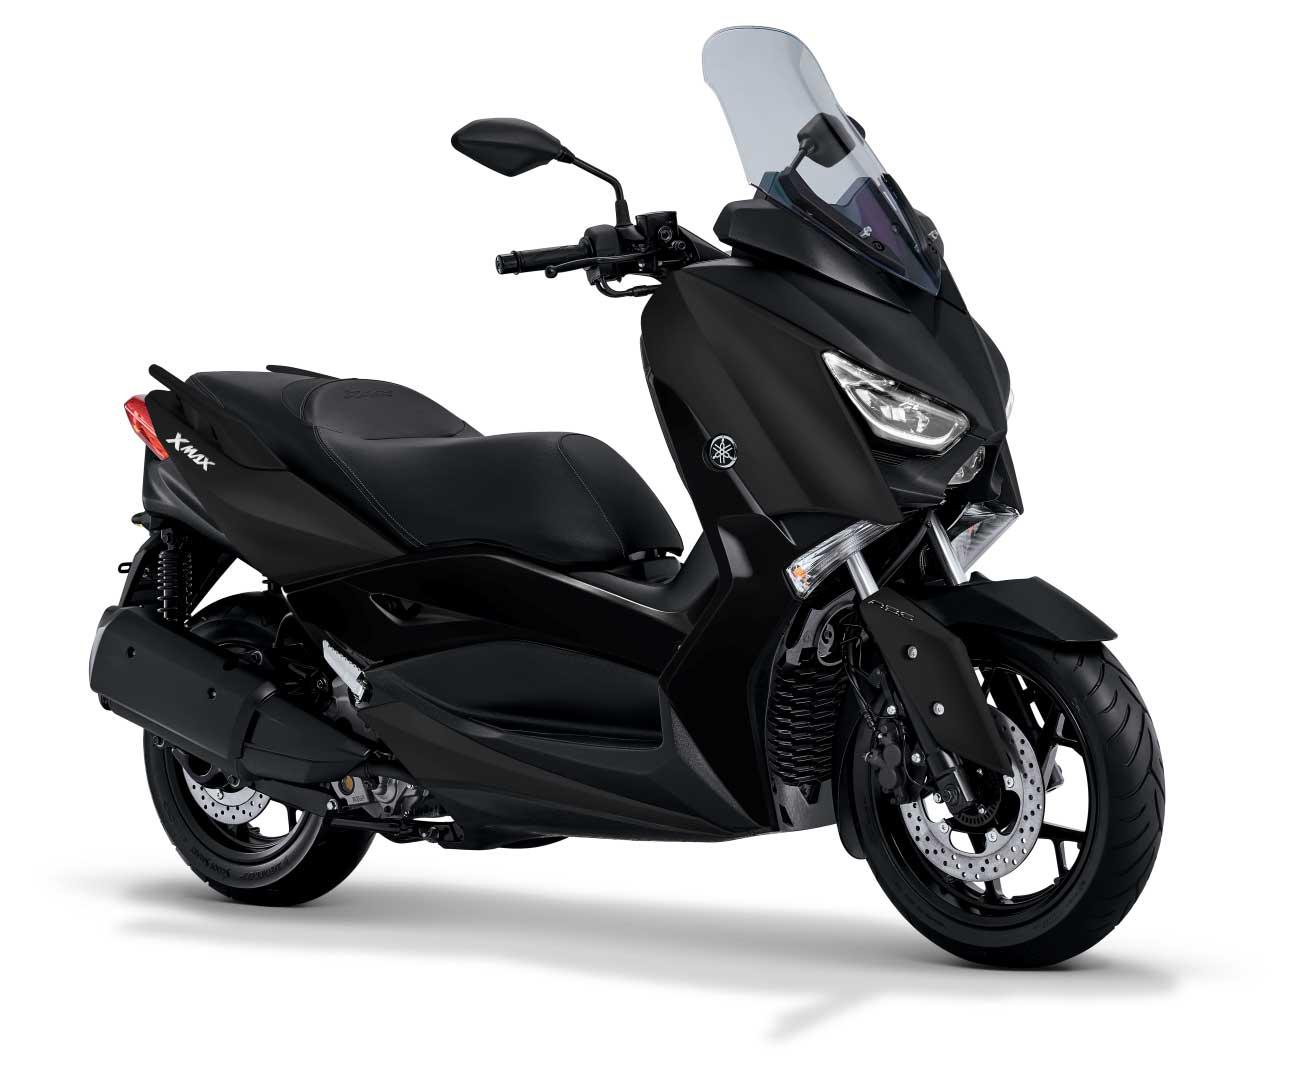 Empat Warna Baru Yamaha XMAX Bisa Dipinang Bulan Depan